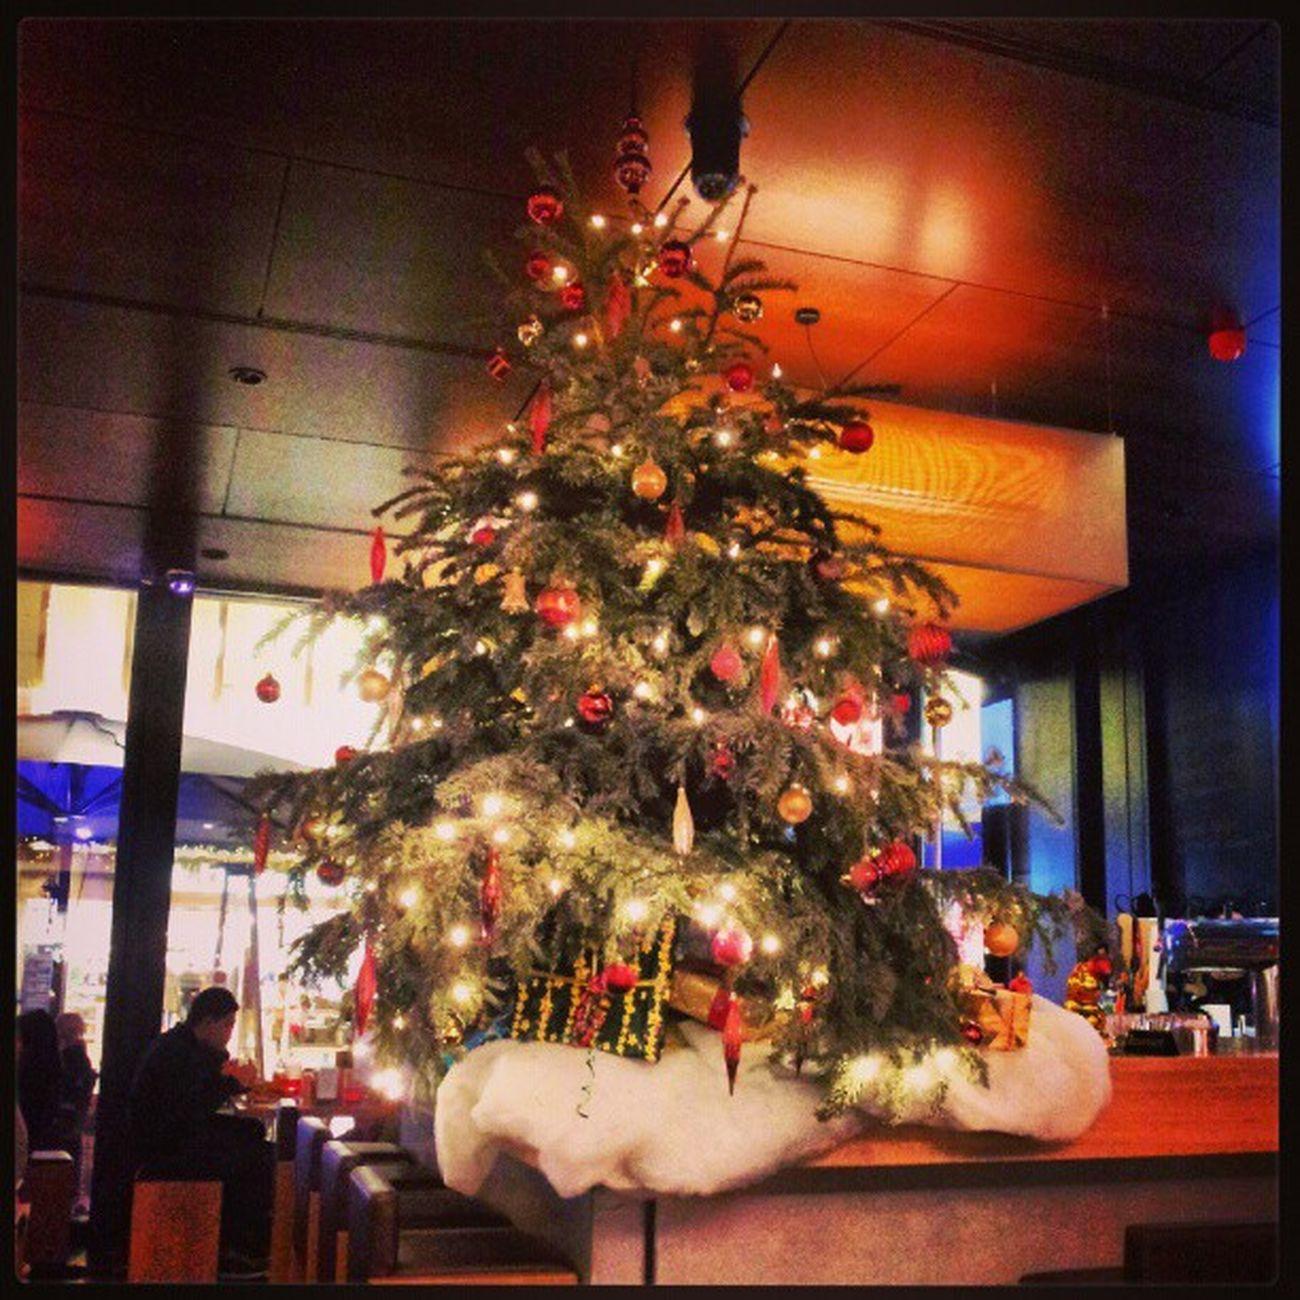 #frankfurt #city #zeil #restaurant #igers #igfamos #instgramm #instagood #spicekitchen #chrismas #tree Igfamos Instgramm Spicekitchen City Tree Restaurant Chrismas Frankfurt Igers Zeil Instagood